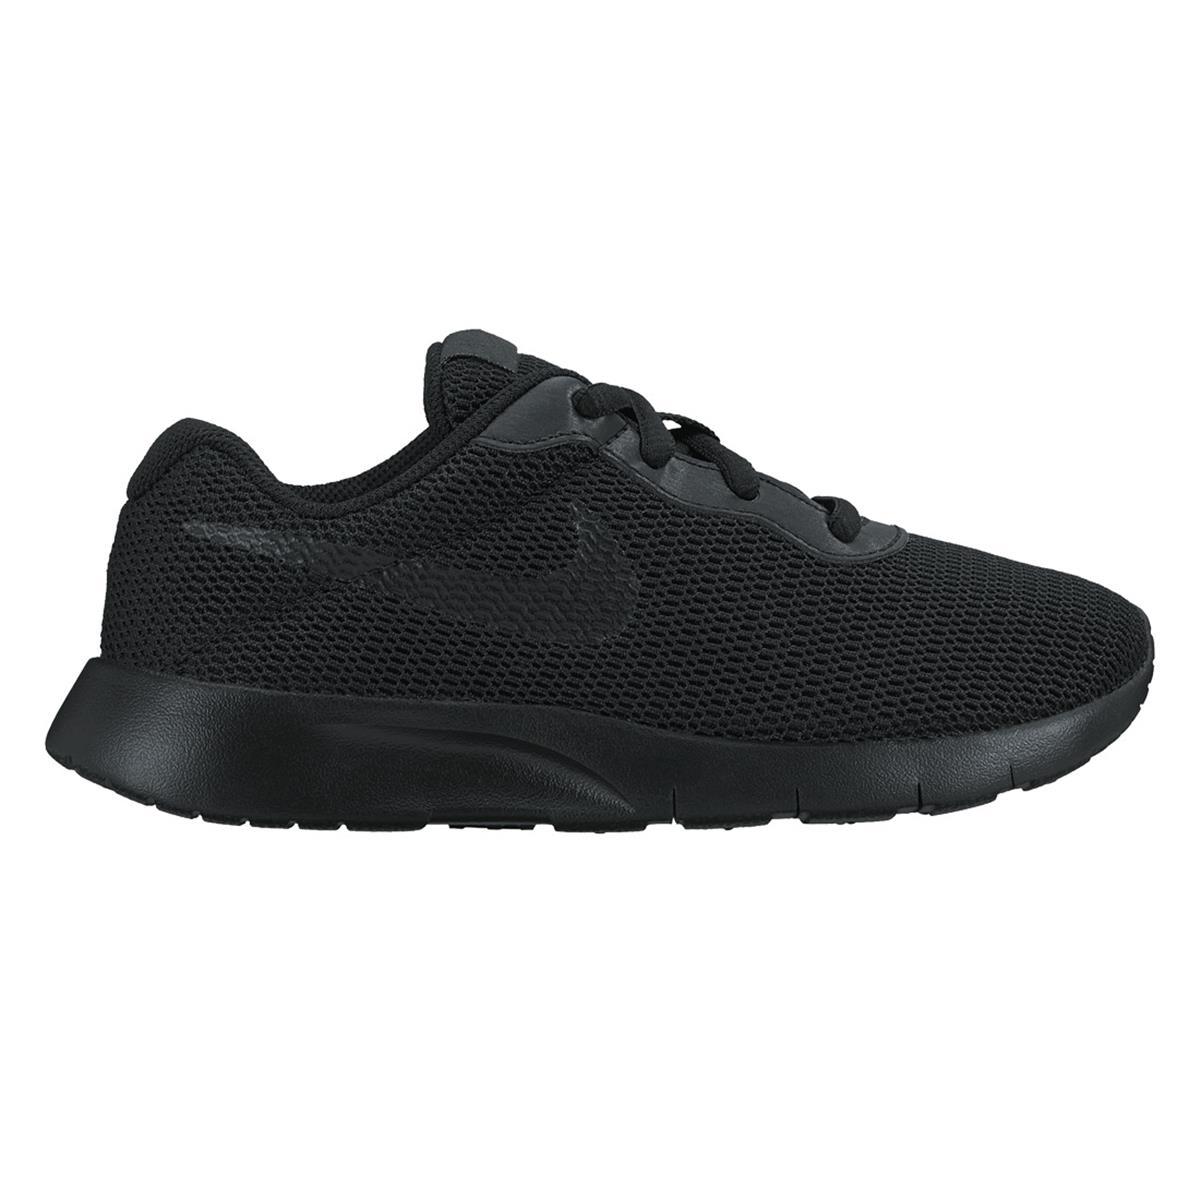 70b31fd091 Nike Tanjun Junior Running Shoes | directsportseshop.co.uk